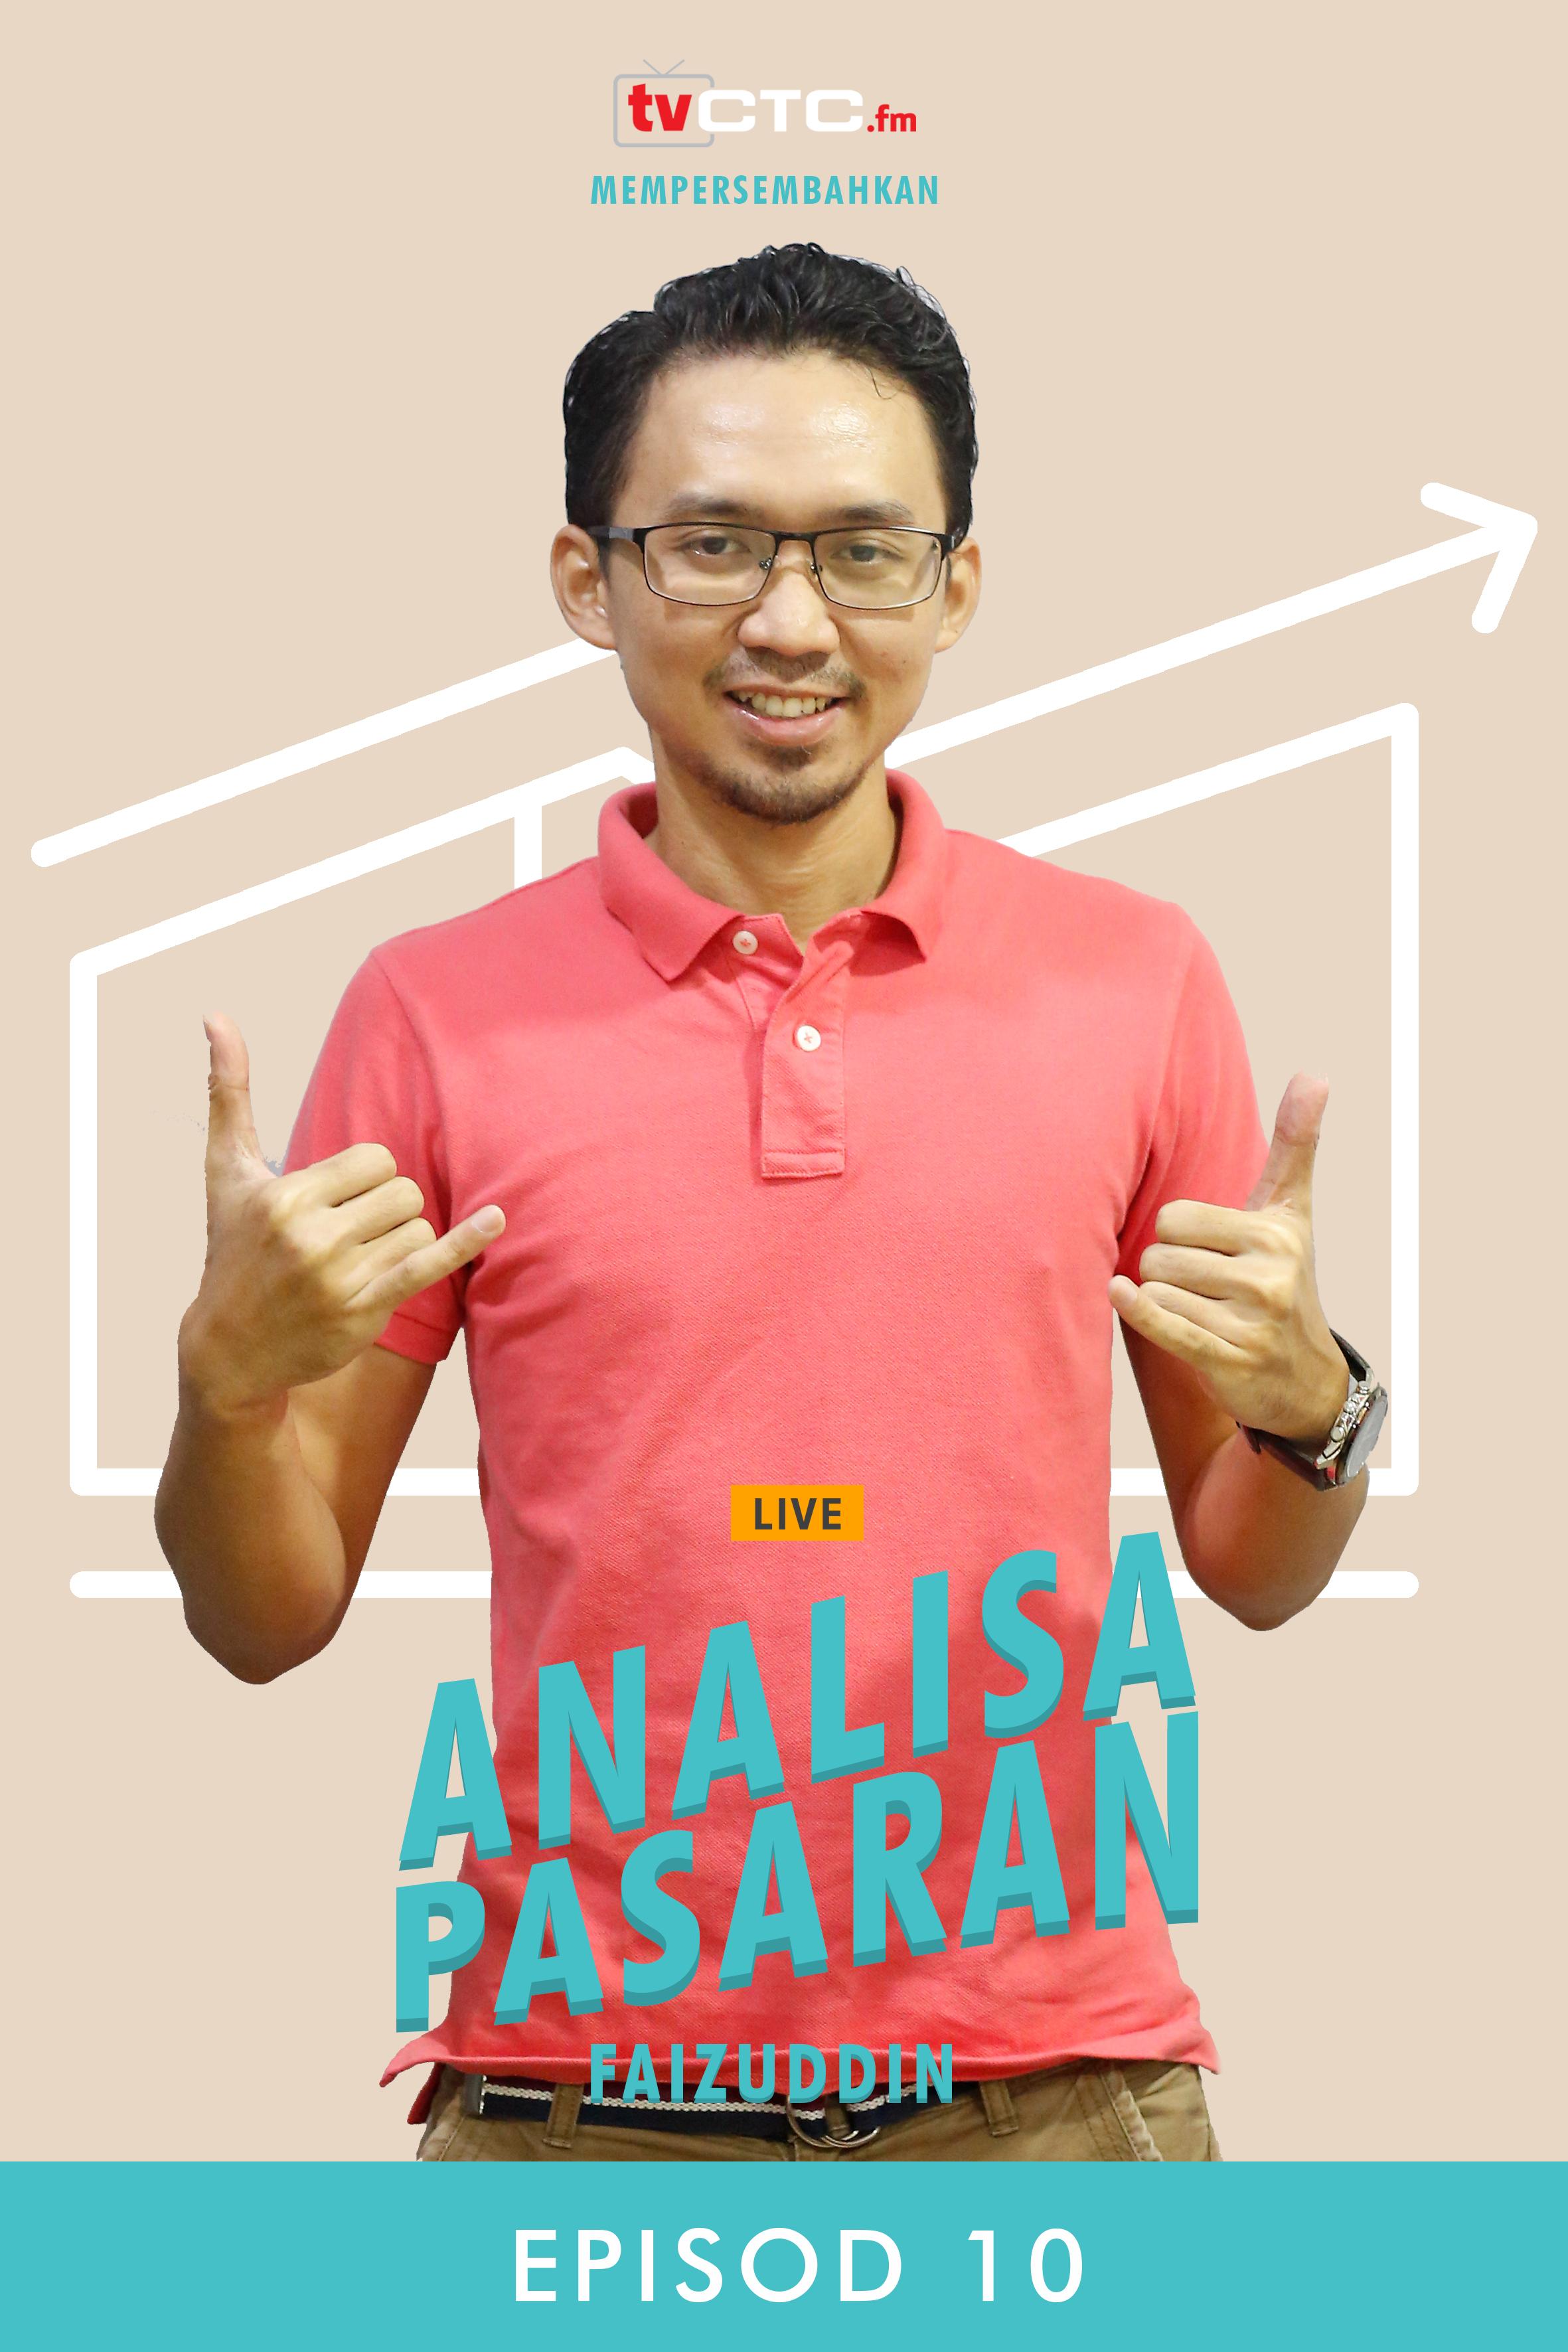 ANALISA PASARAN : Faizuddin (Episod 10)